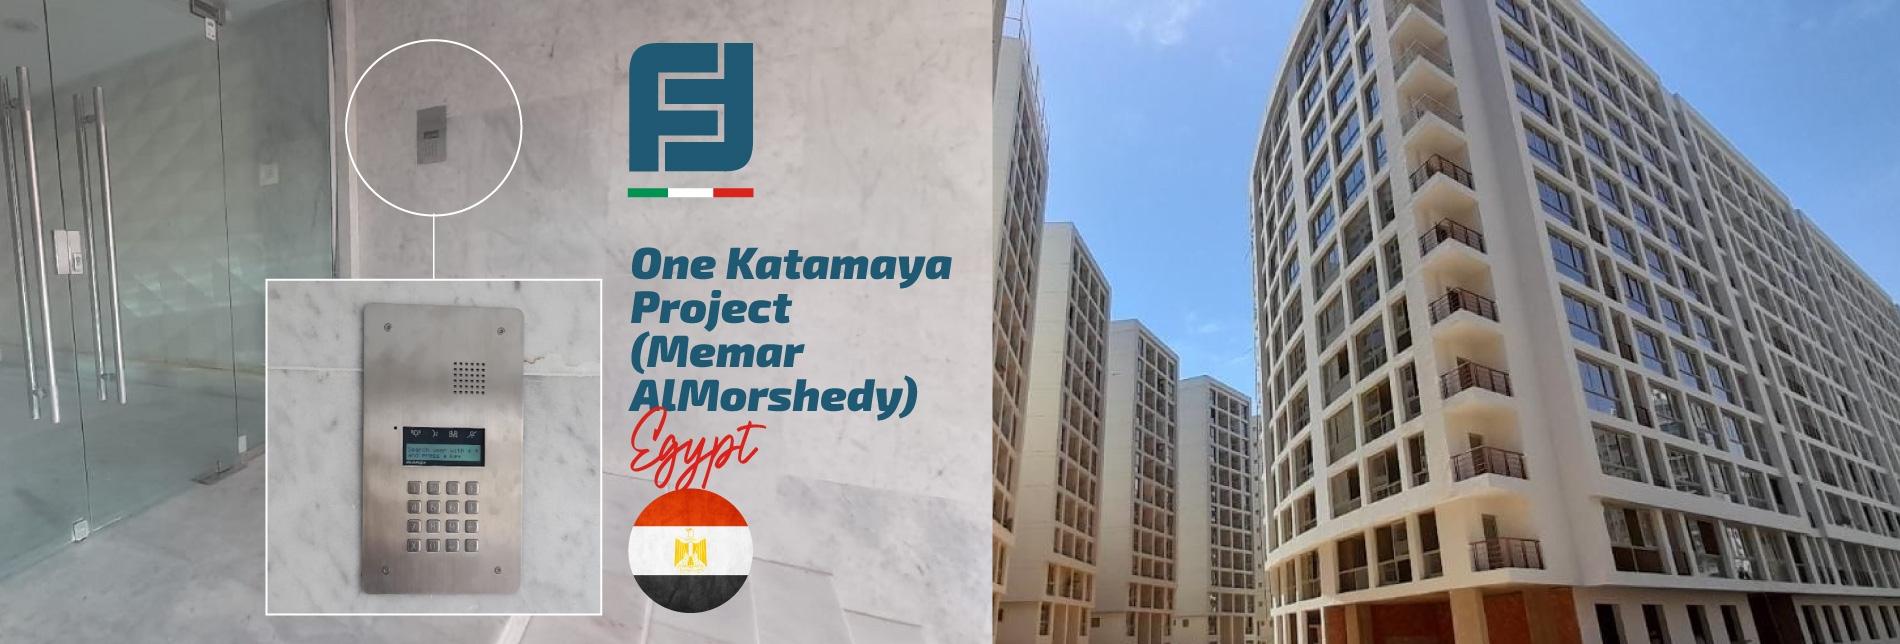 Africa One Katamaya Project Al Memar Morshedy Egypt